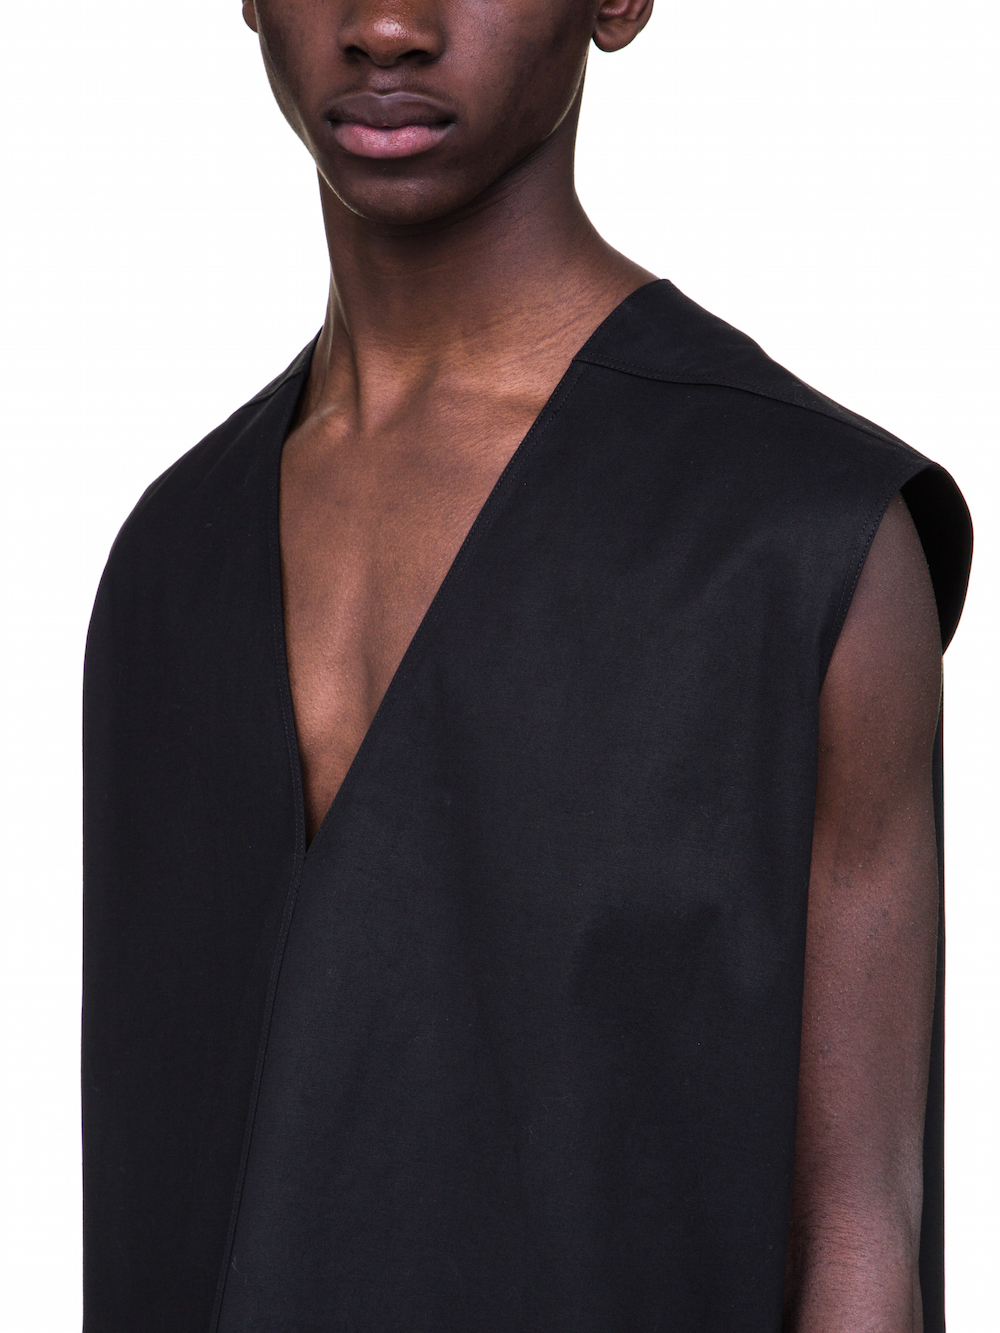 RICK OWENS NECK JUMBO TOP IN BLACK